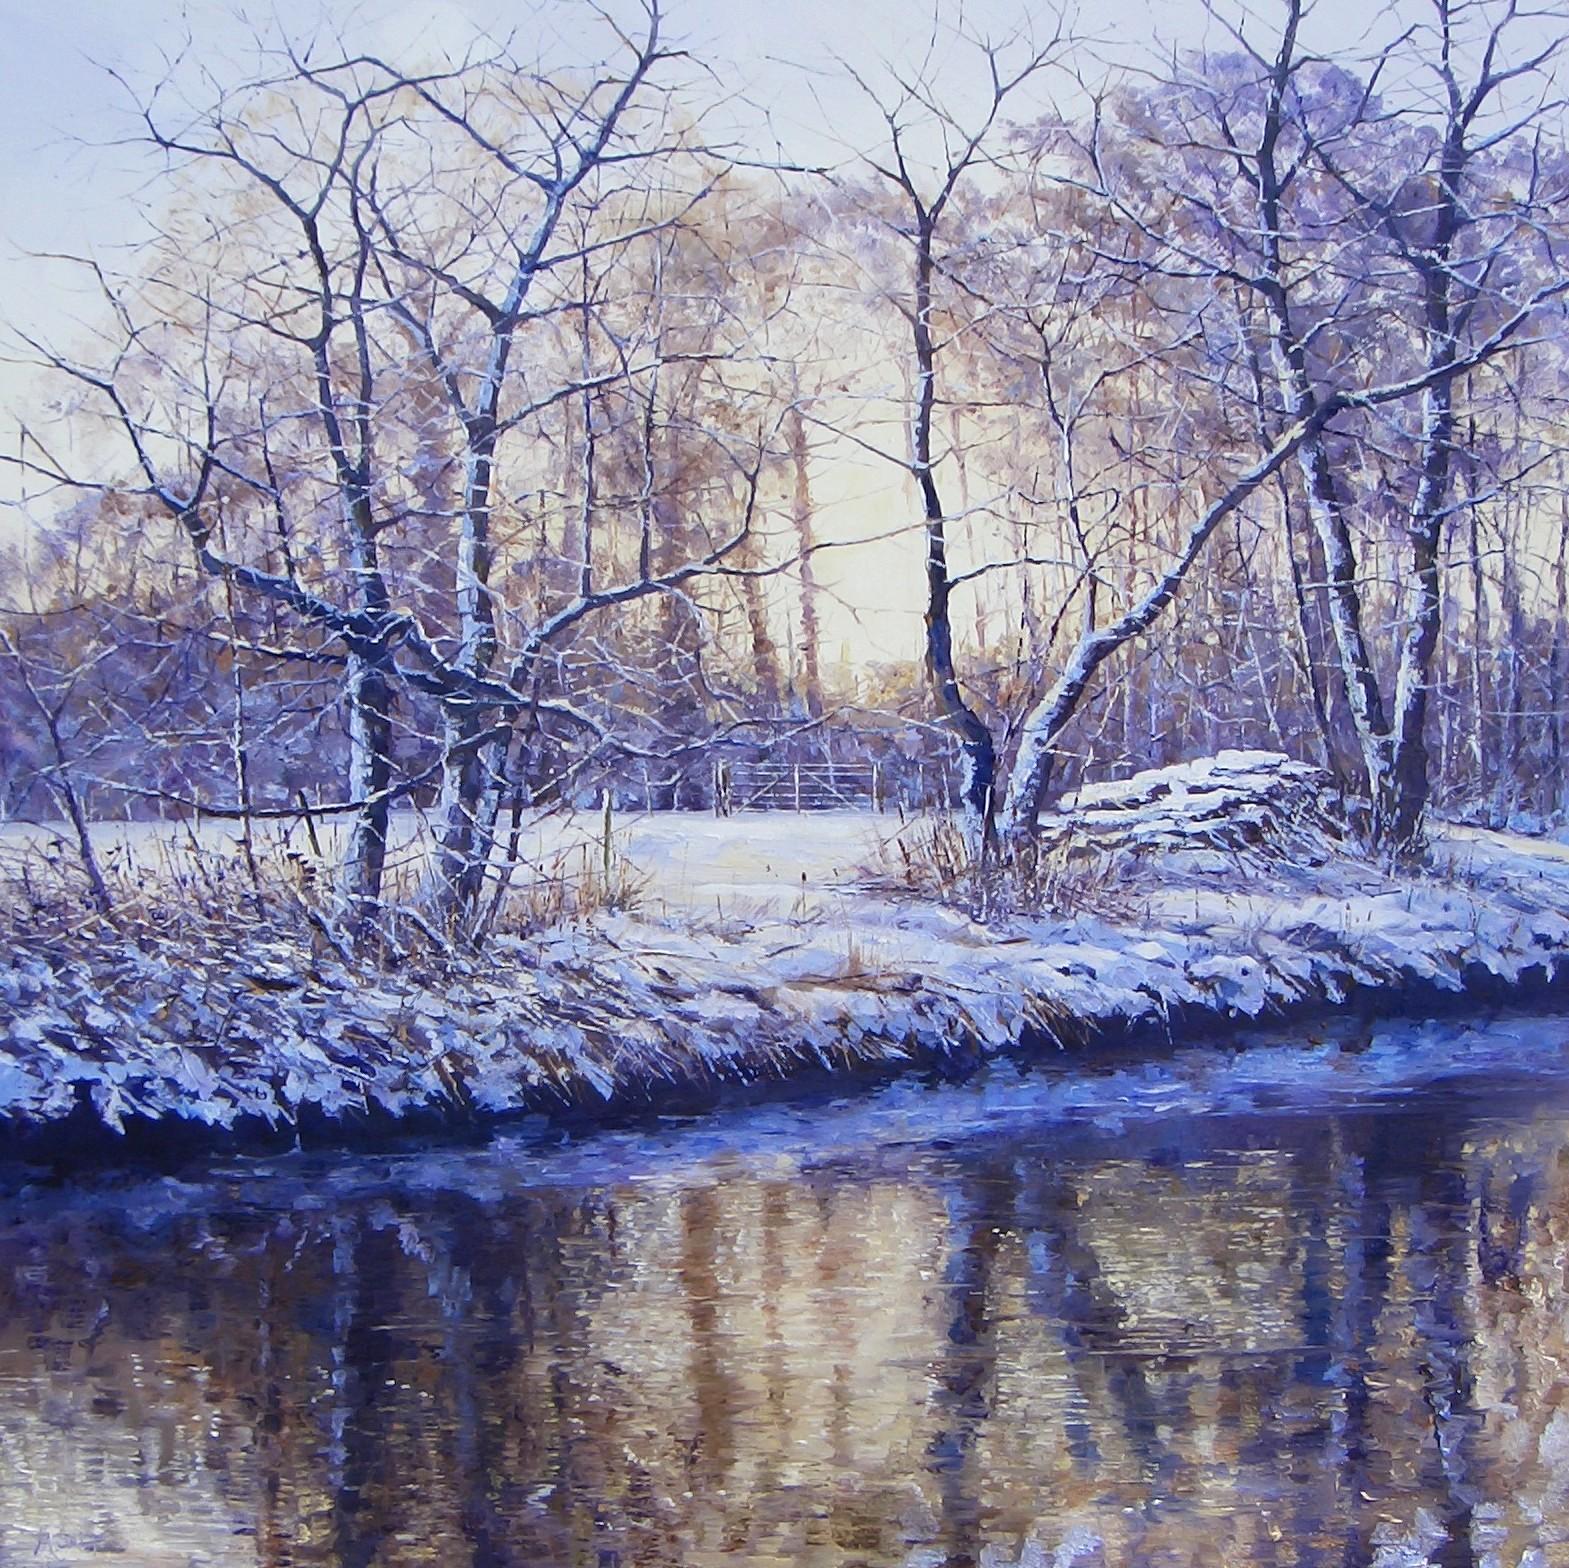 Winterlight,60cm_x_60cm,£185.jpg